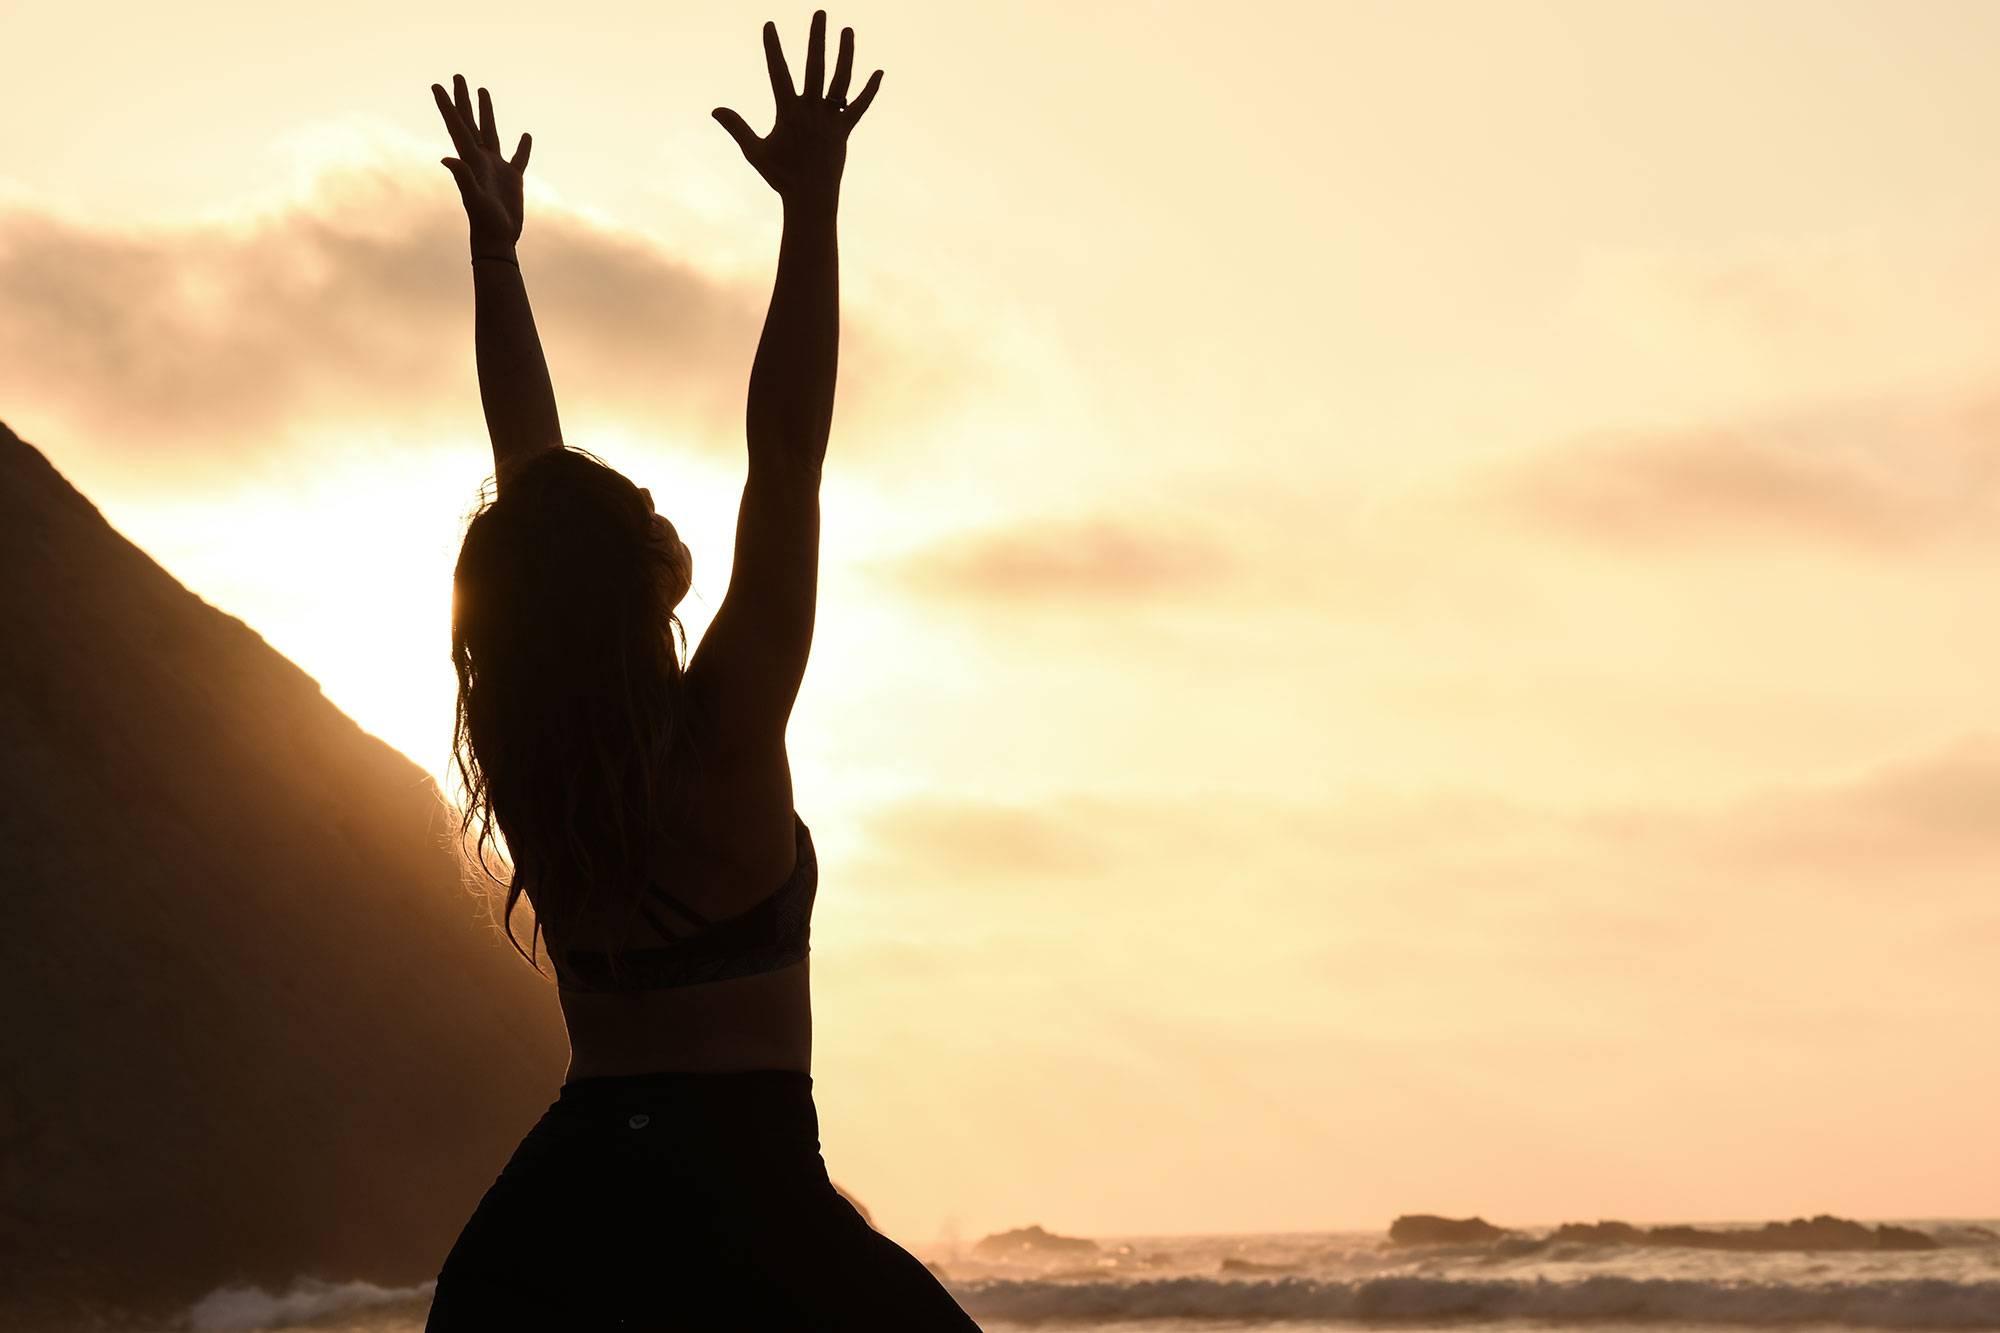 https://www.soulandsurf.com/wp-content/uploads/2021/07/@katiearaephoto_Yoga_On-the-beach_4.jpg Image